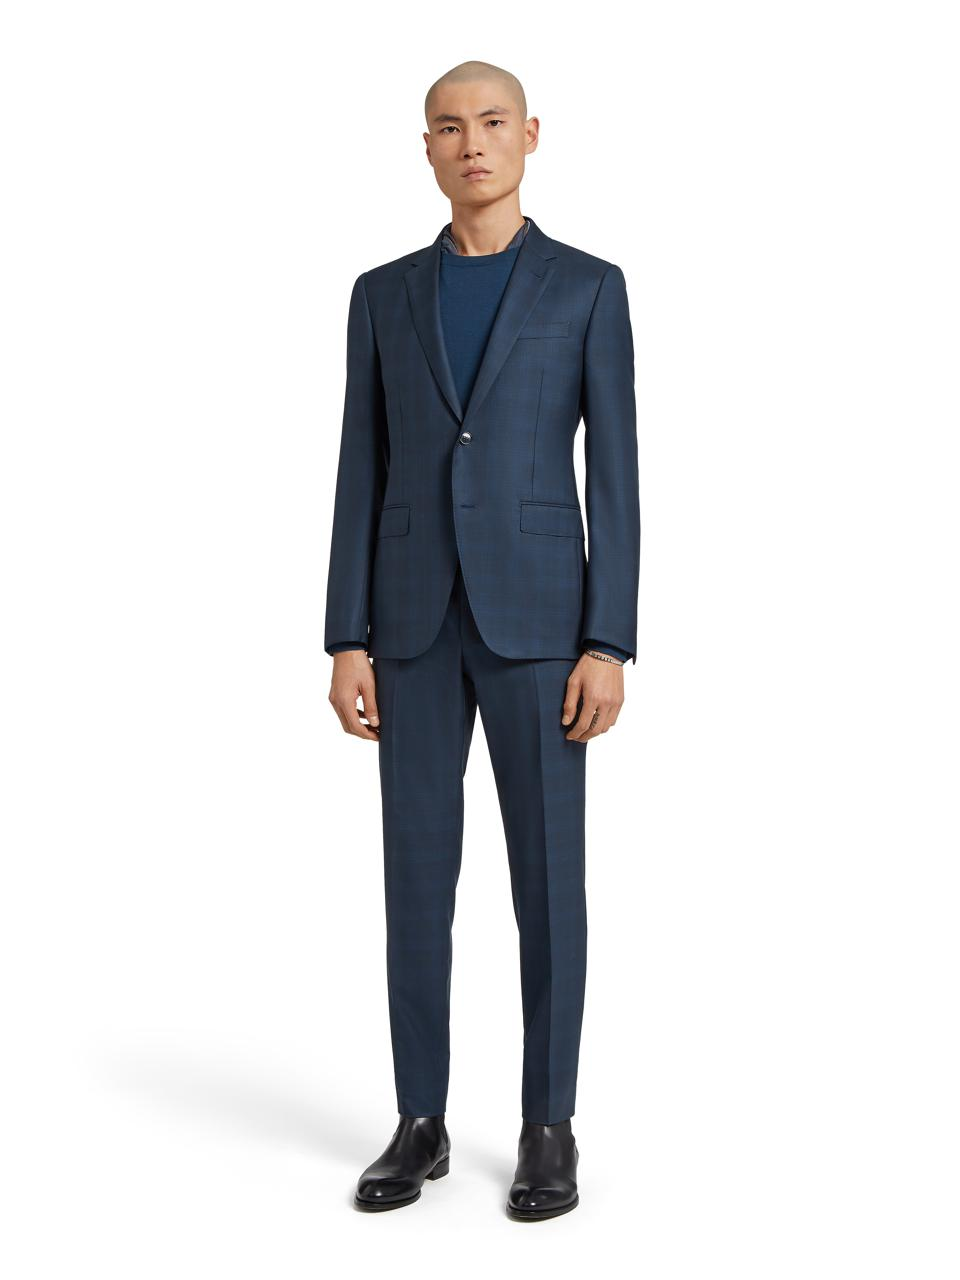 Wool and Silk Trofeo Suit by Ermenegildo Zegna